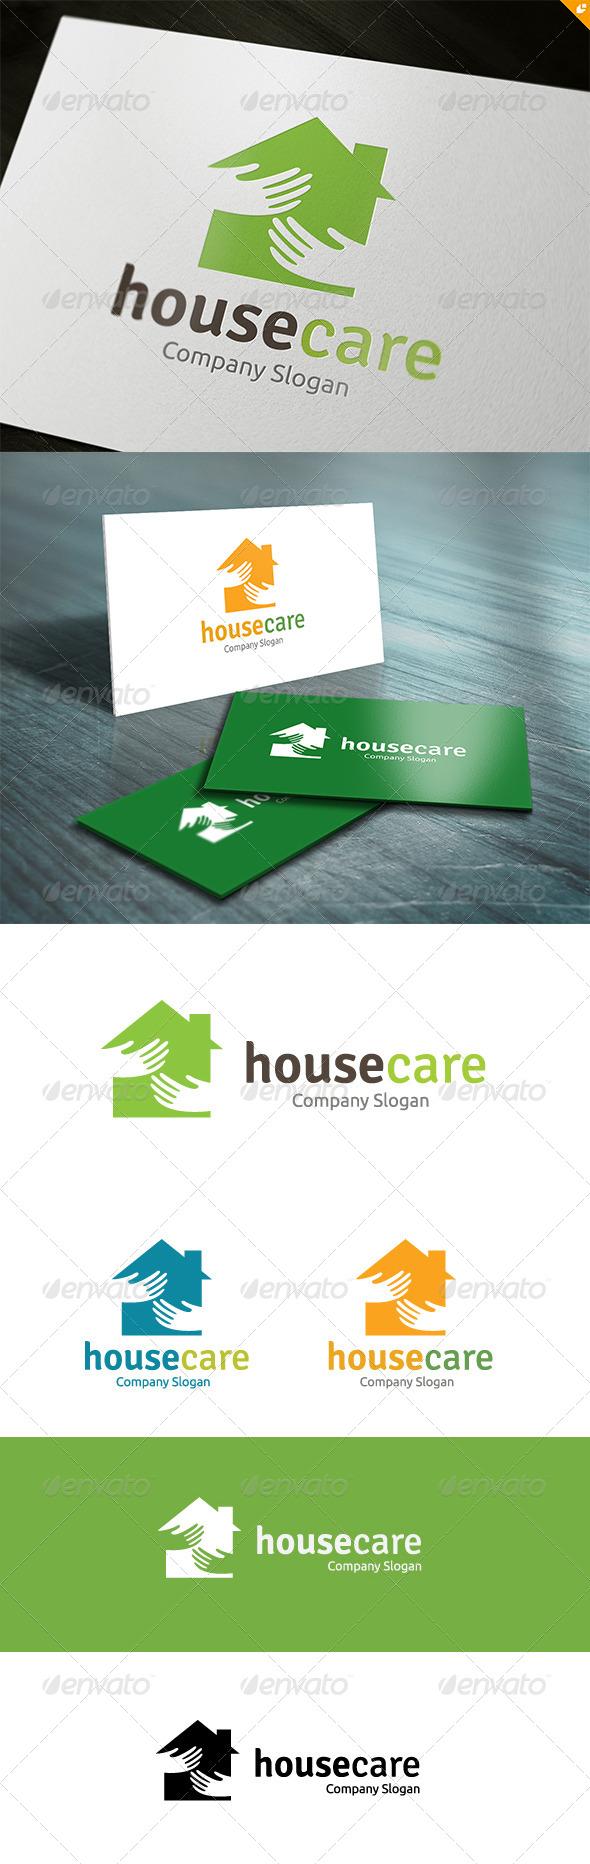 GraphicRiver House Care 5253937